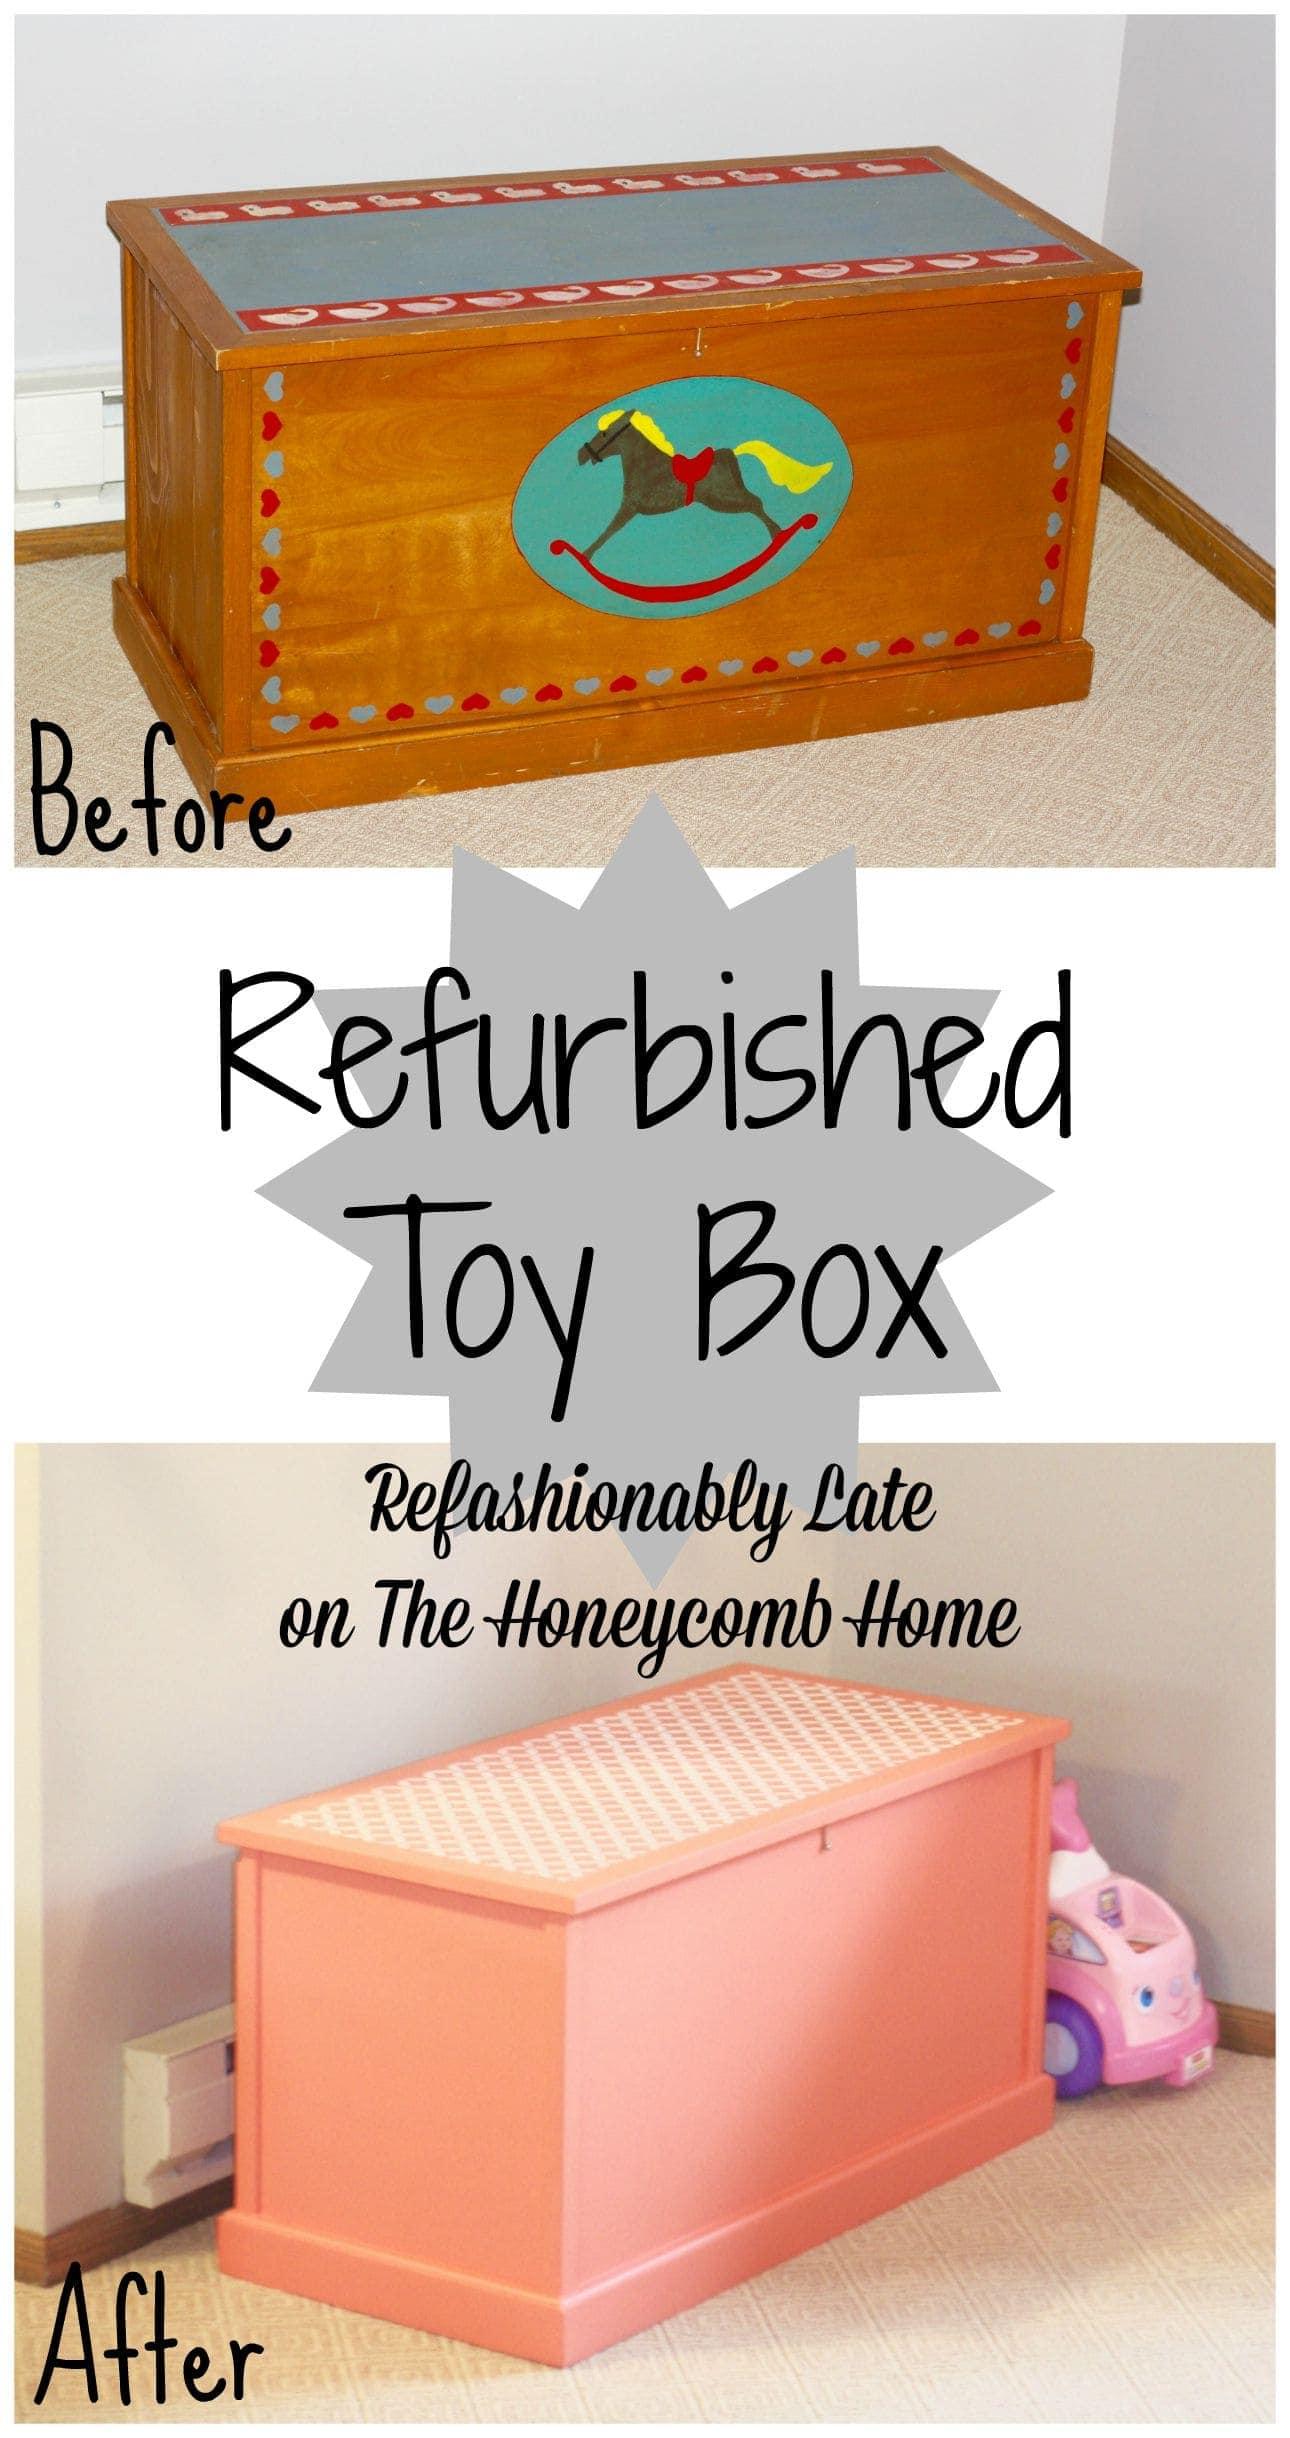 Refurbished Toy Box - www.refashionablylate.com